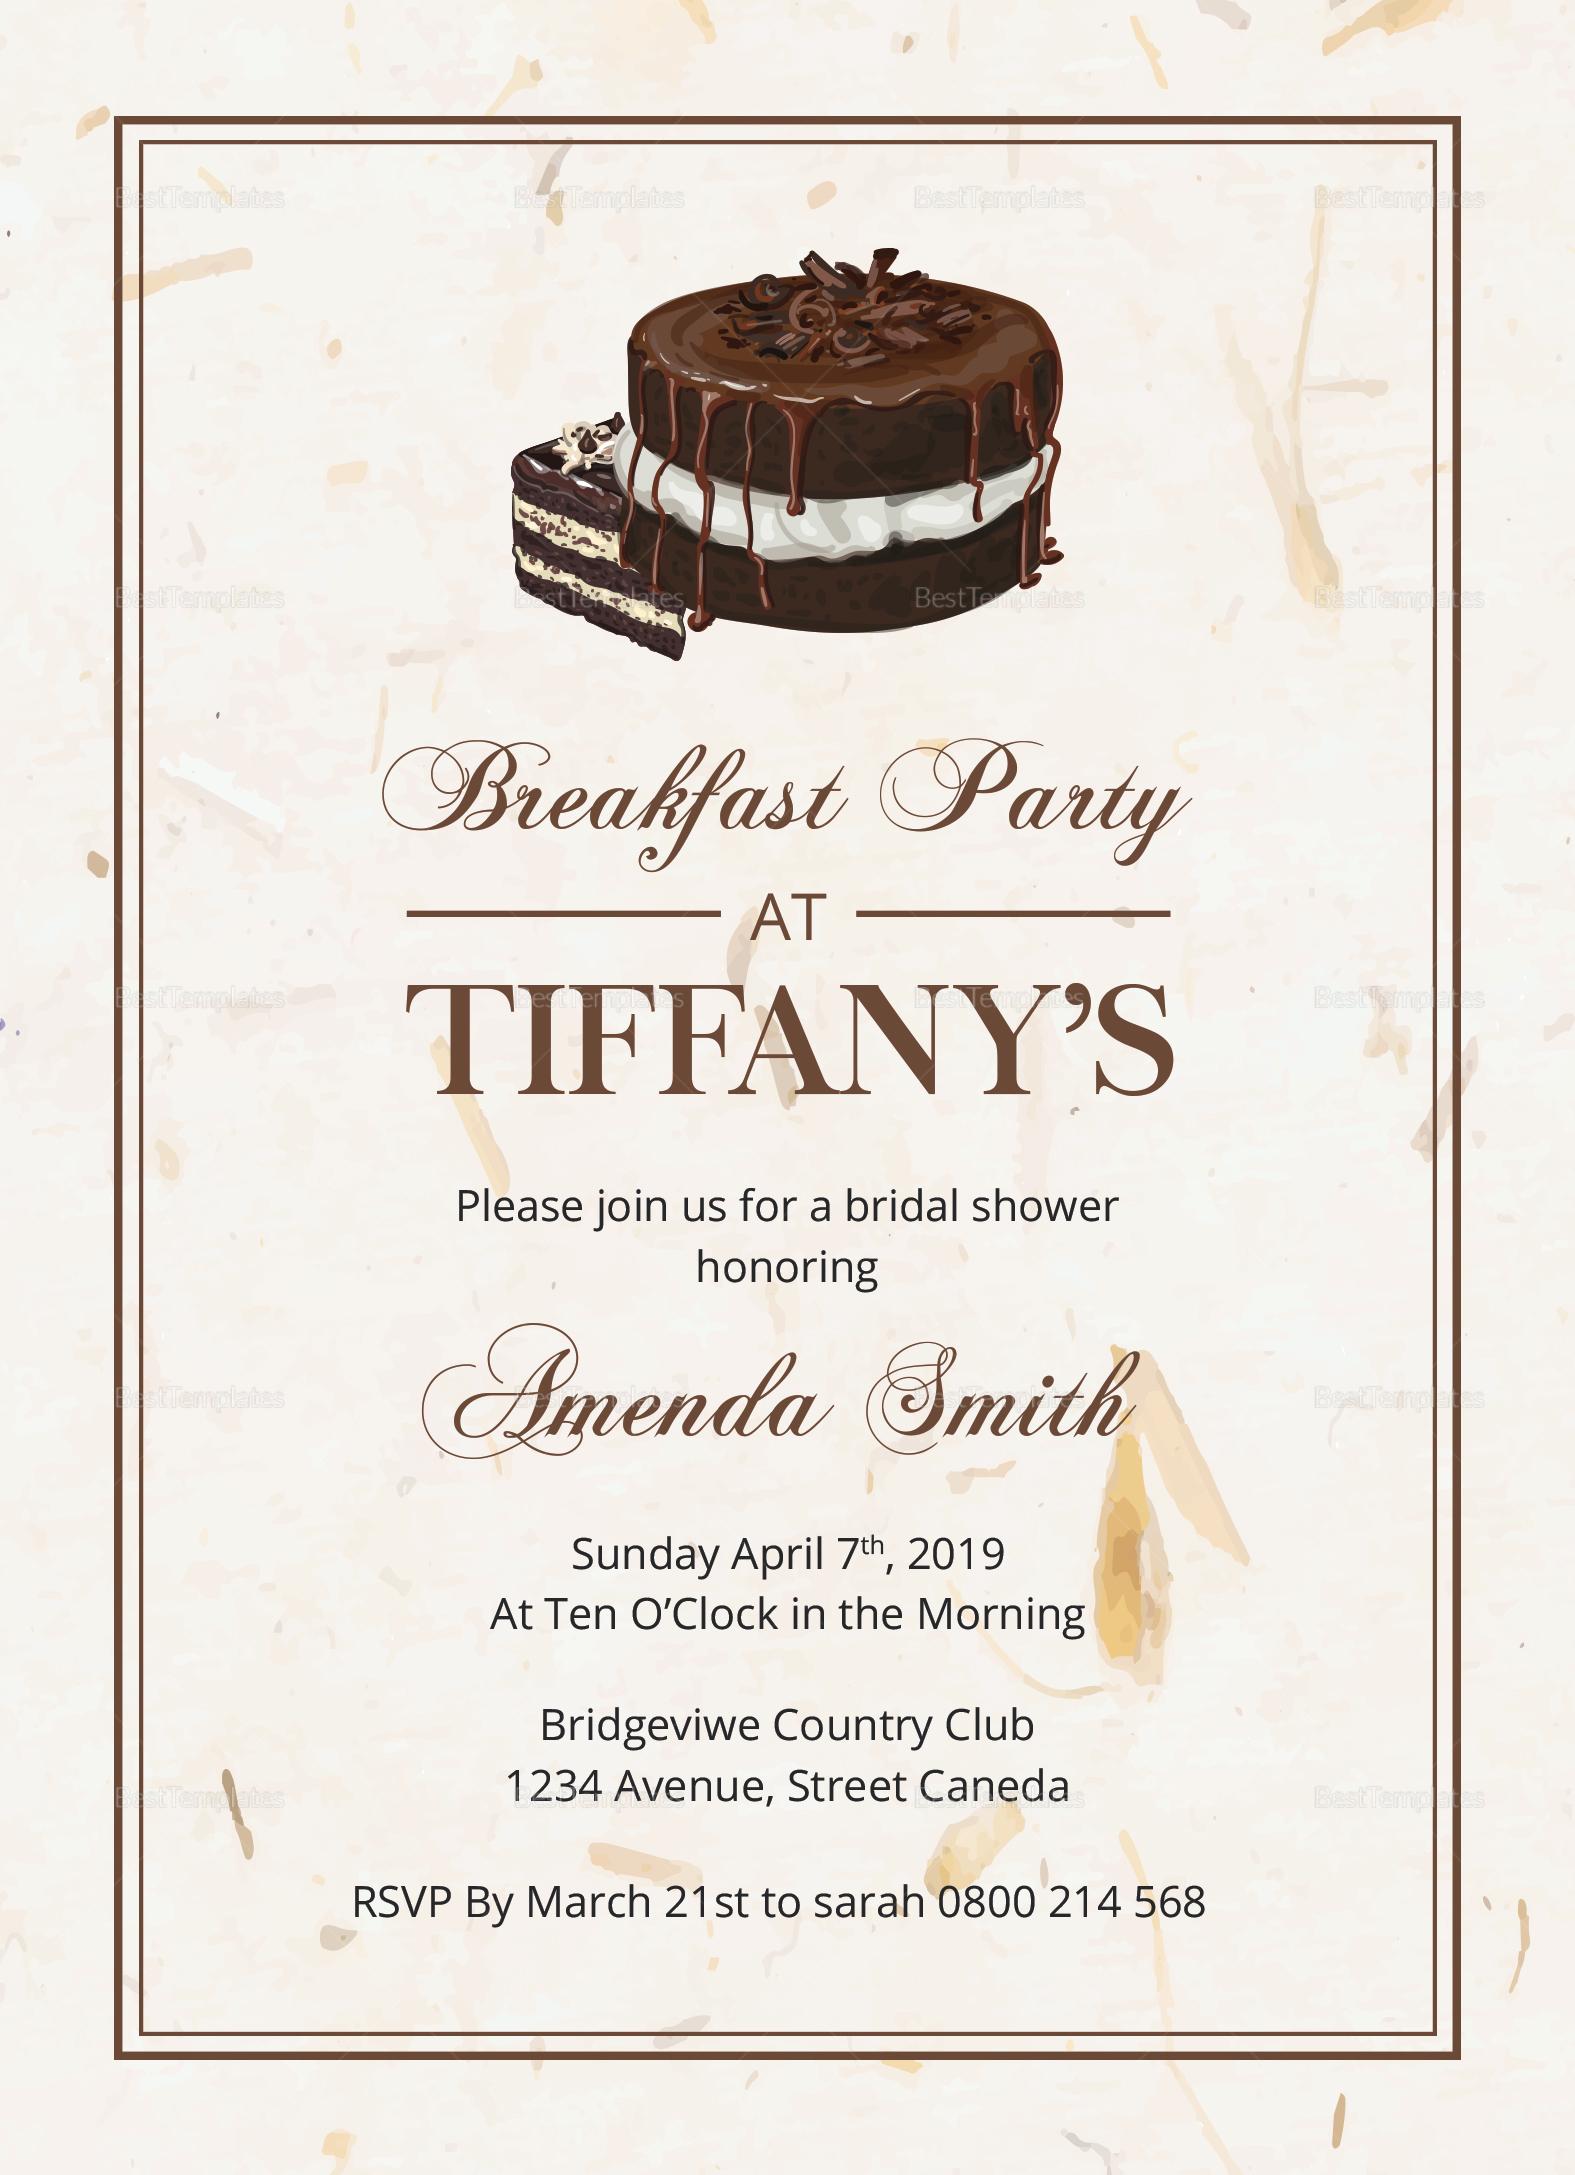 Bridal Shower Breakfast Invitation Design Template